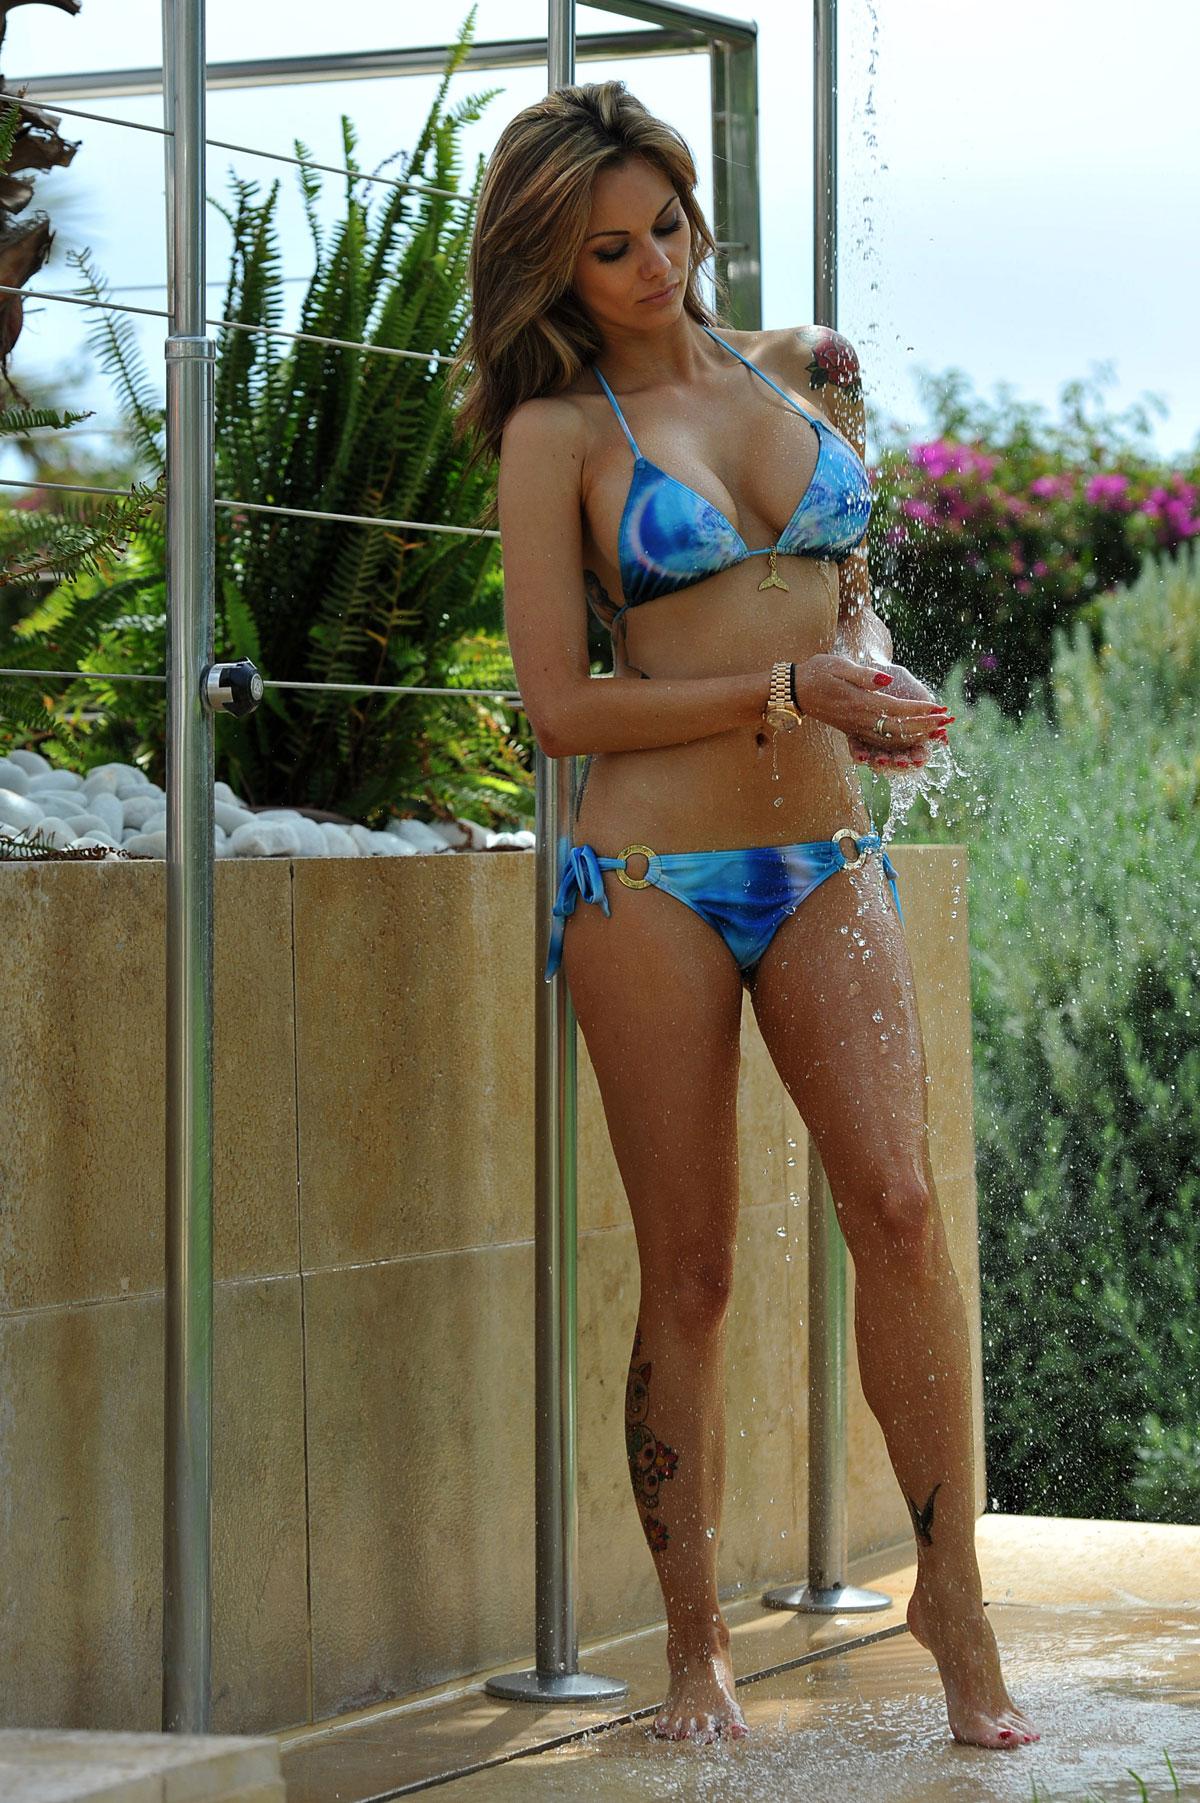 Jessica jane clement bikini 4